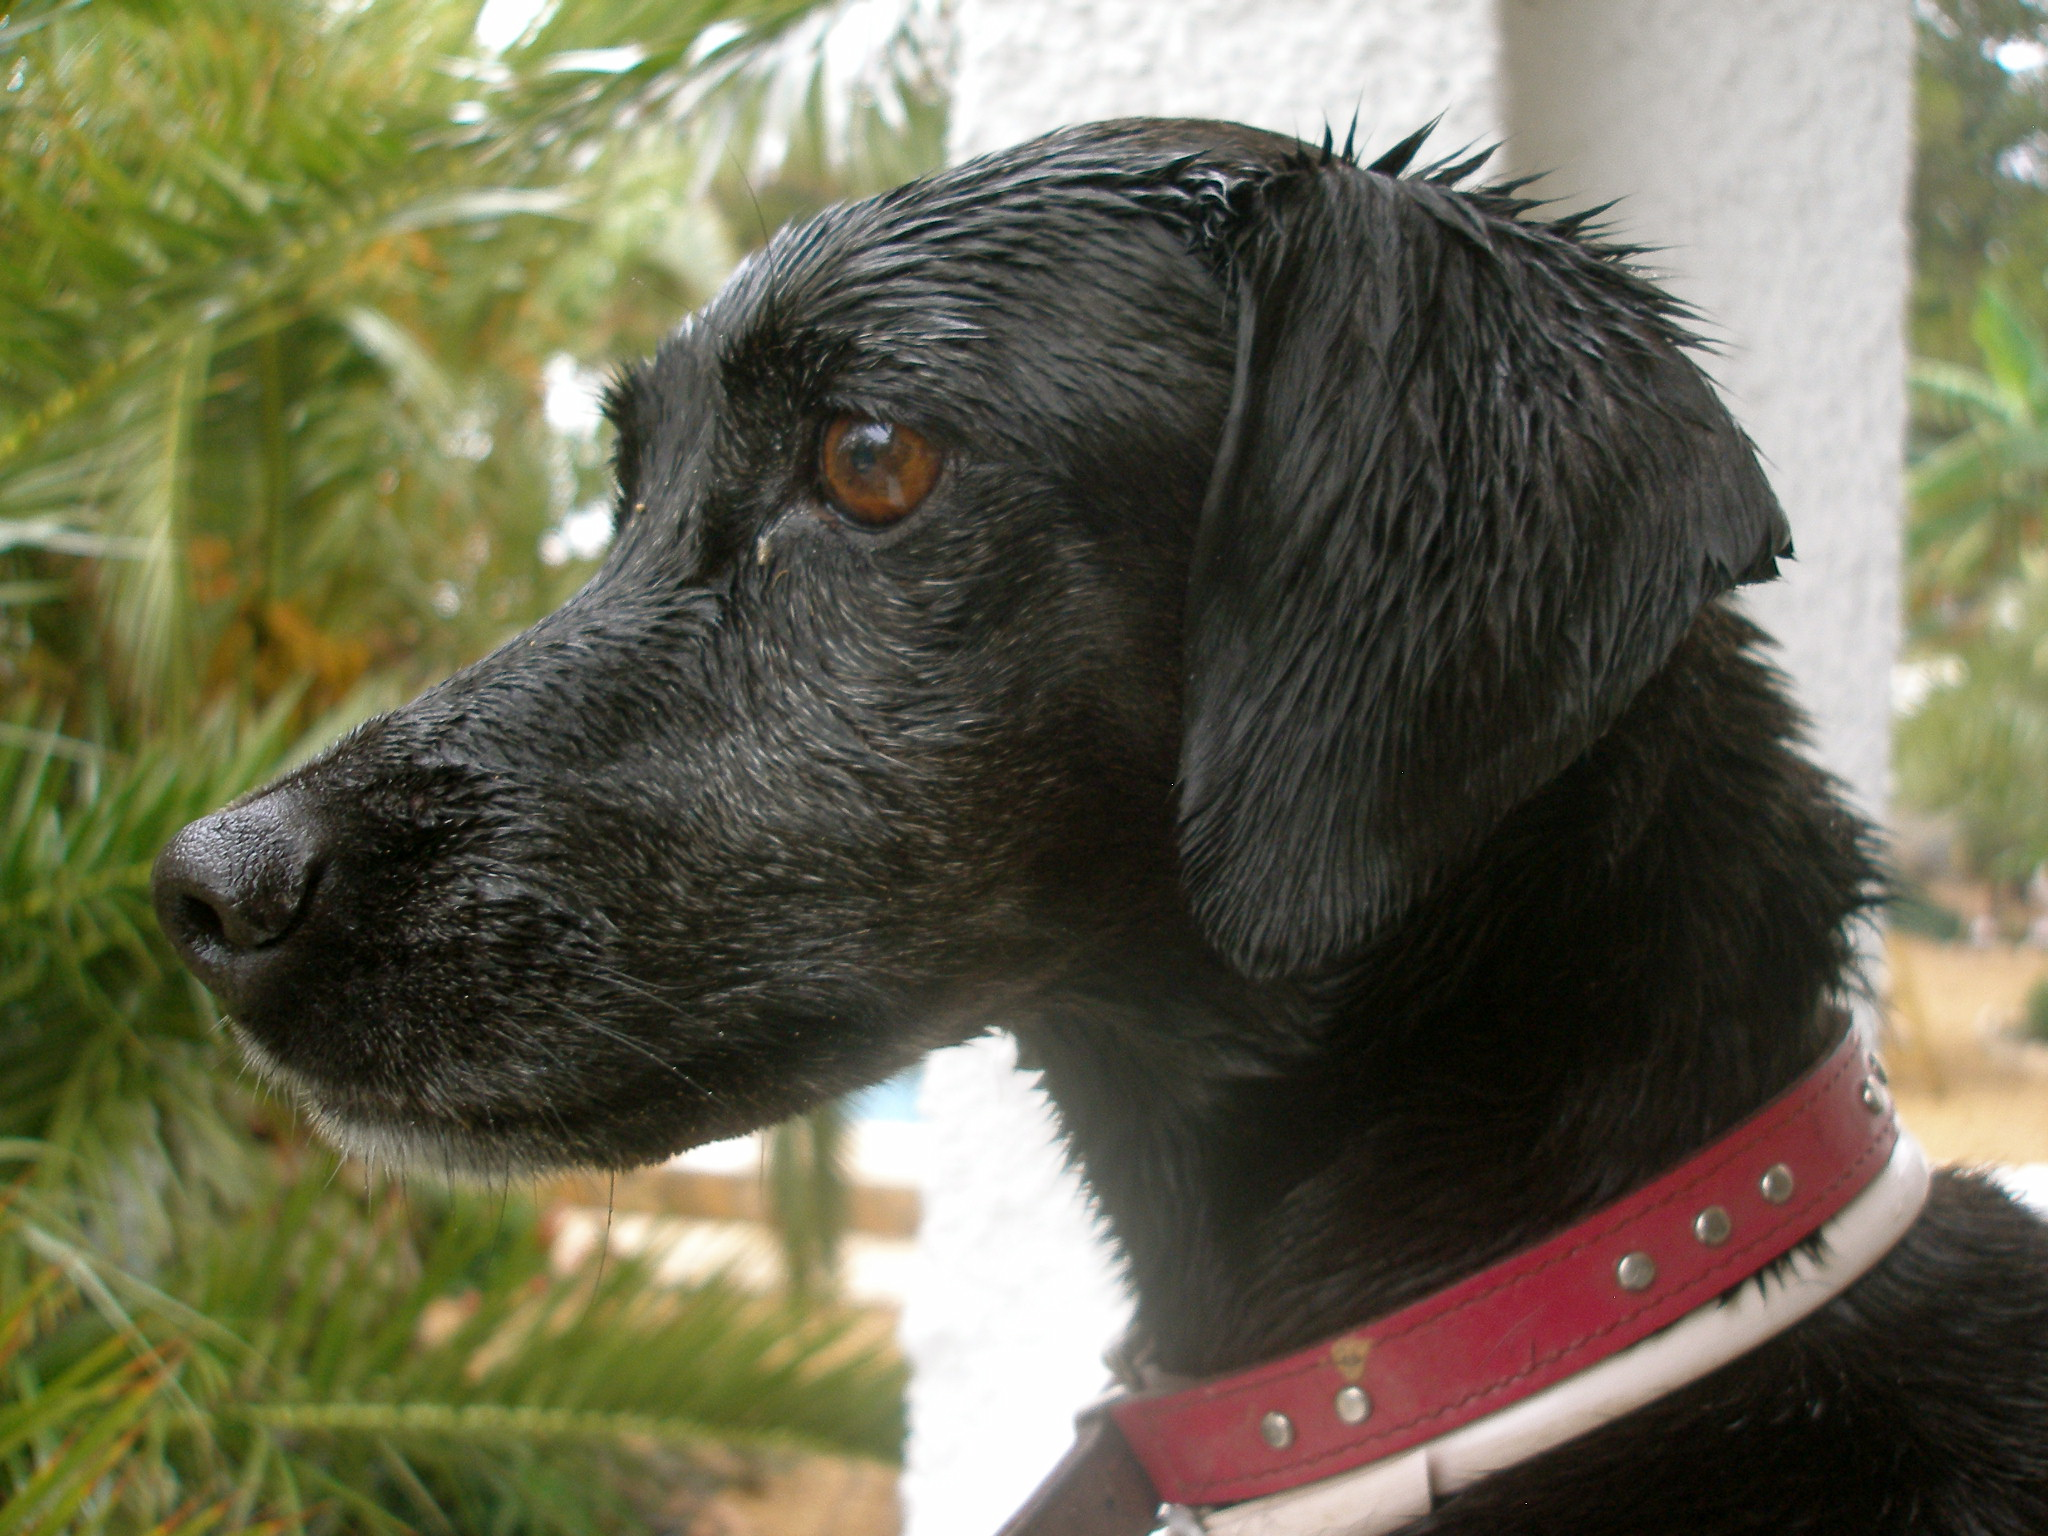 http://upload.wikimedia.org/wikipedia/commons/e/e5/Black_dog_head_shot.jpg